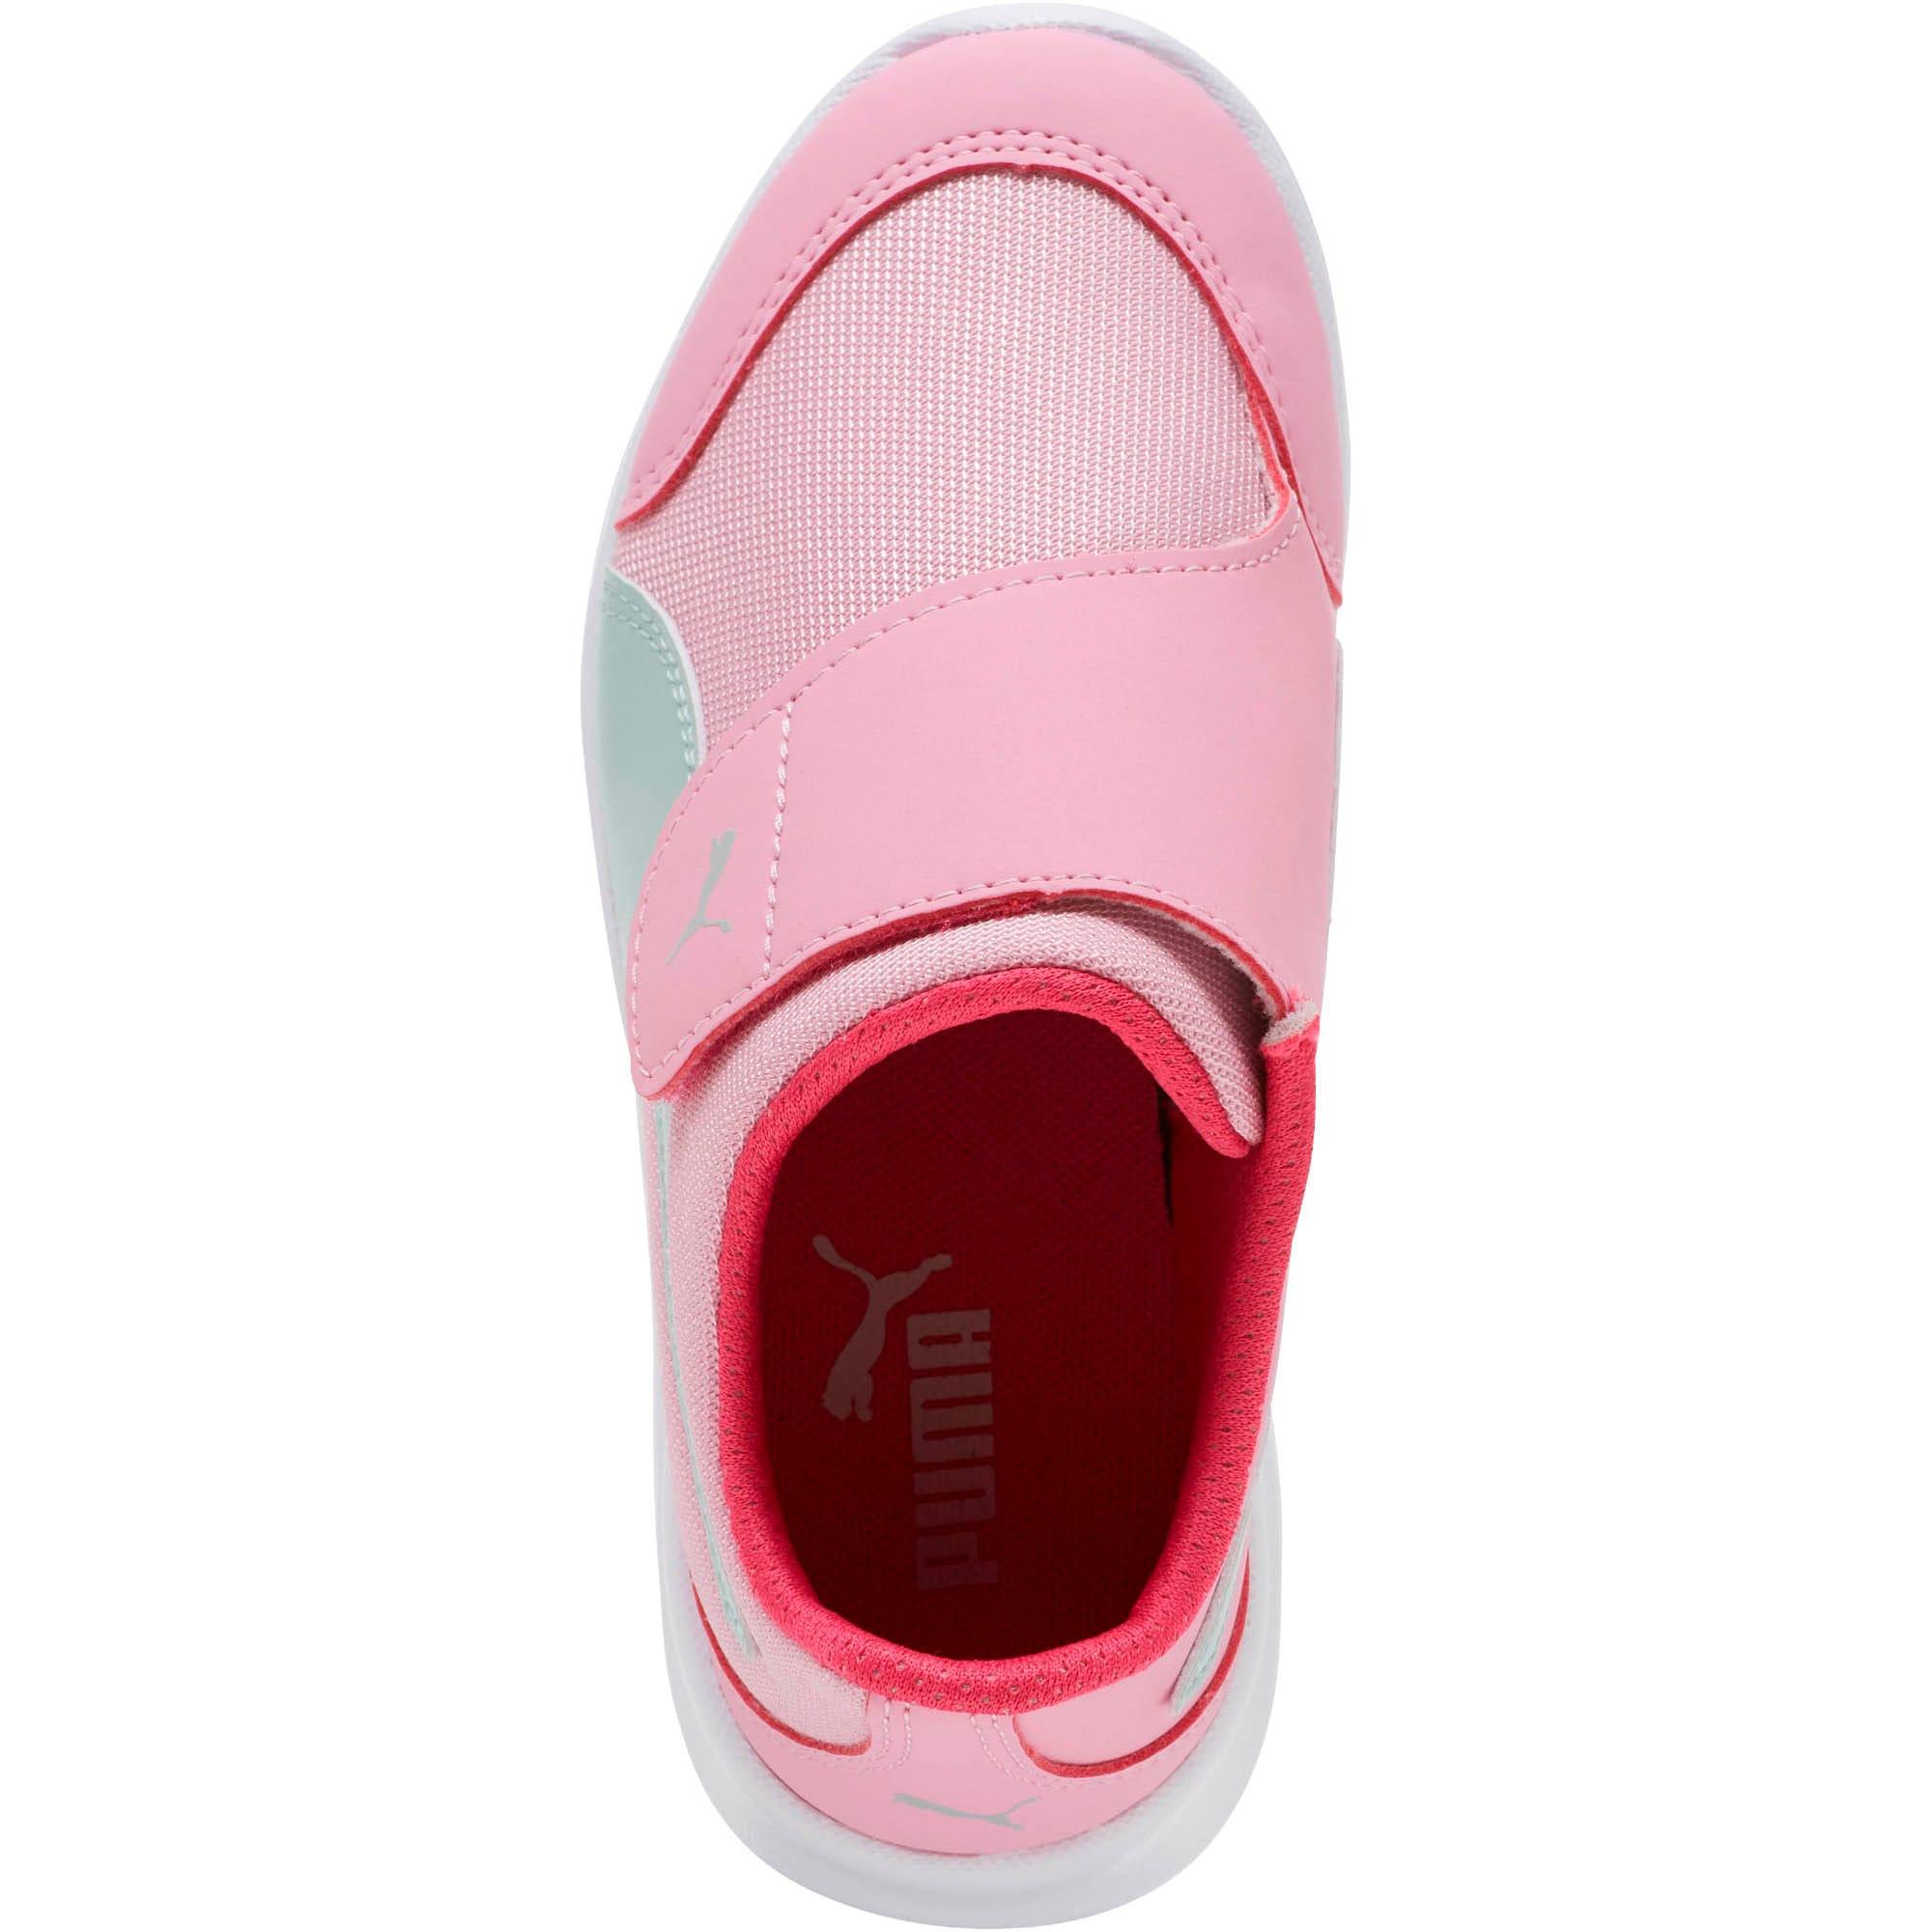 Thumbnail 5 of Bao 3 AC Little Kids' Shoes, Pale Pink-Fair Aqua-Purple, medium